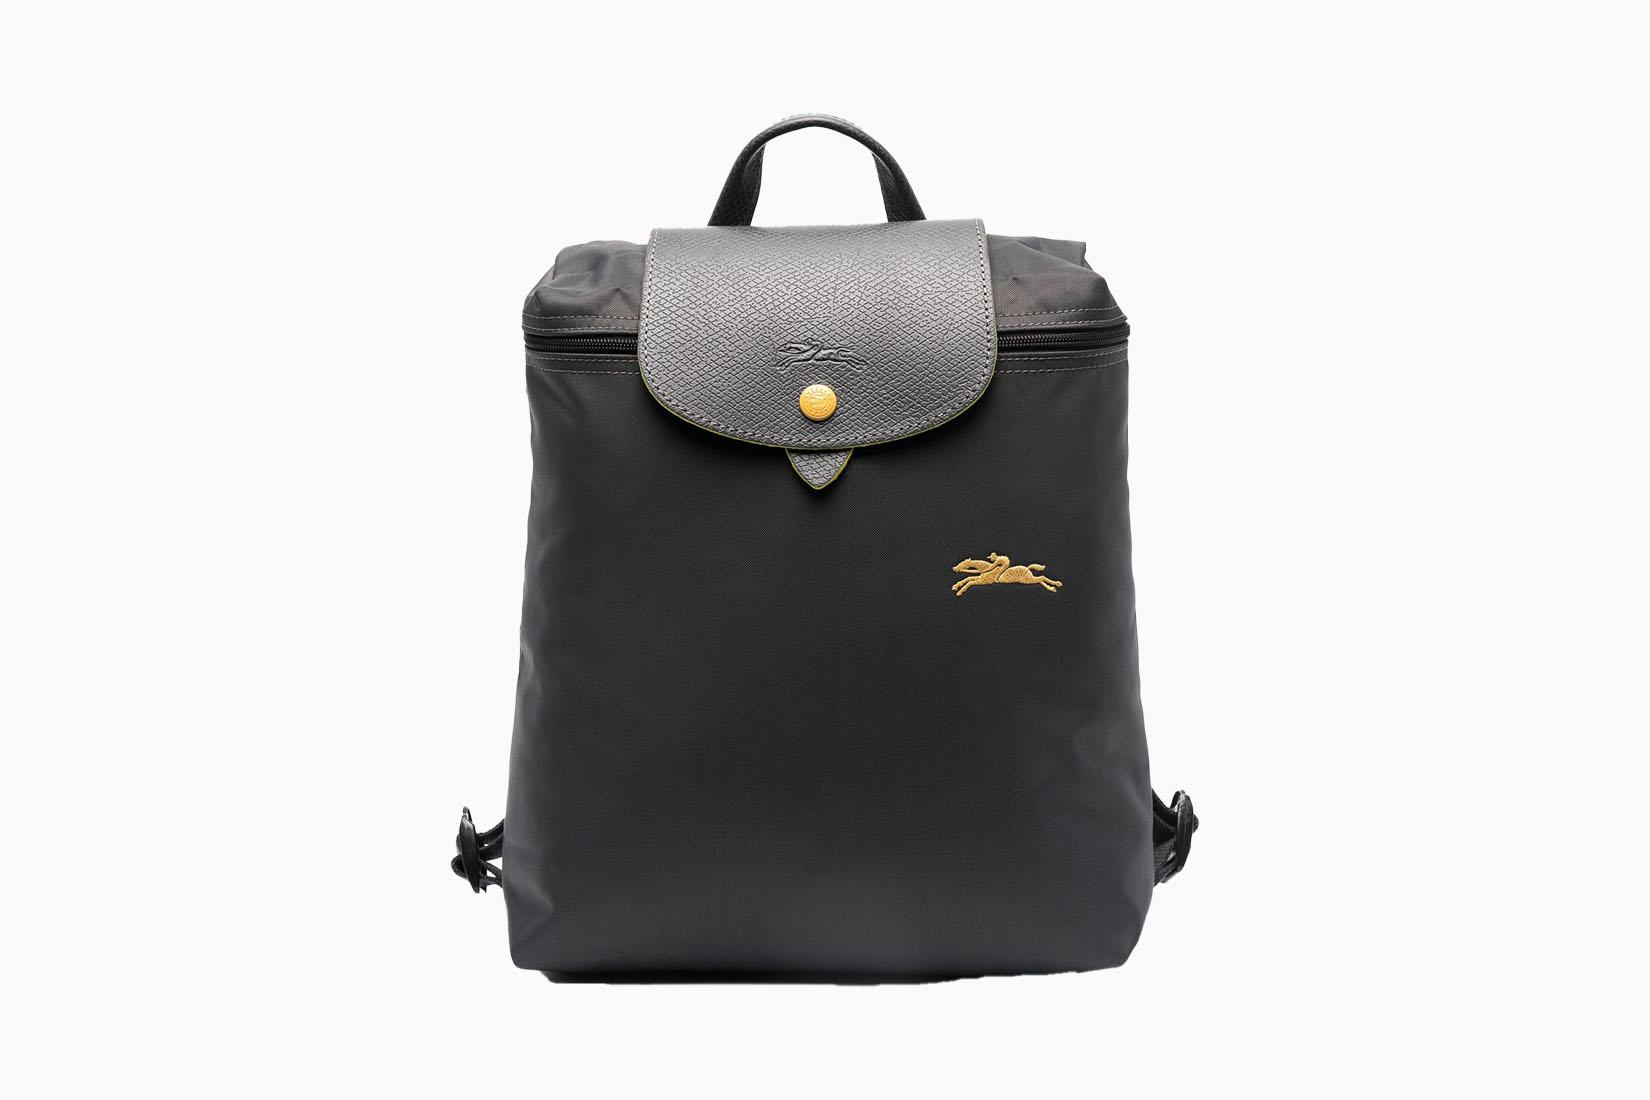 best backpacks women longchamp review Luxe Digital